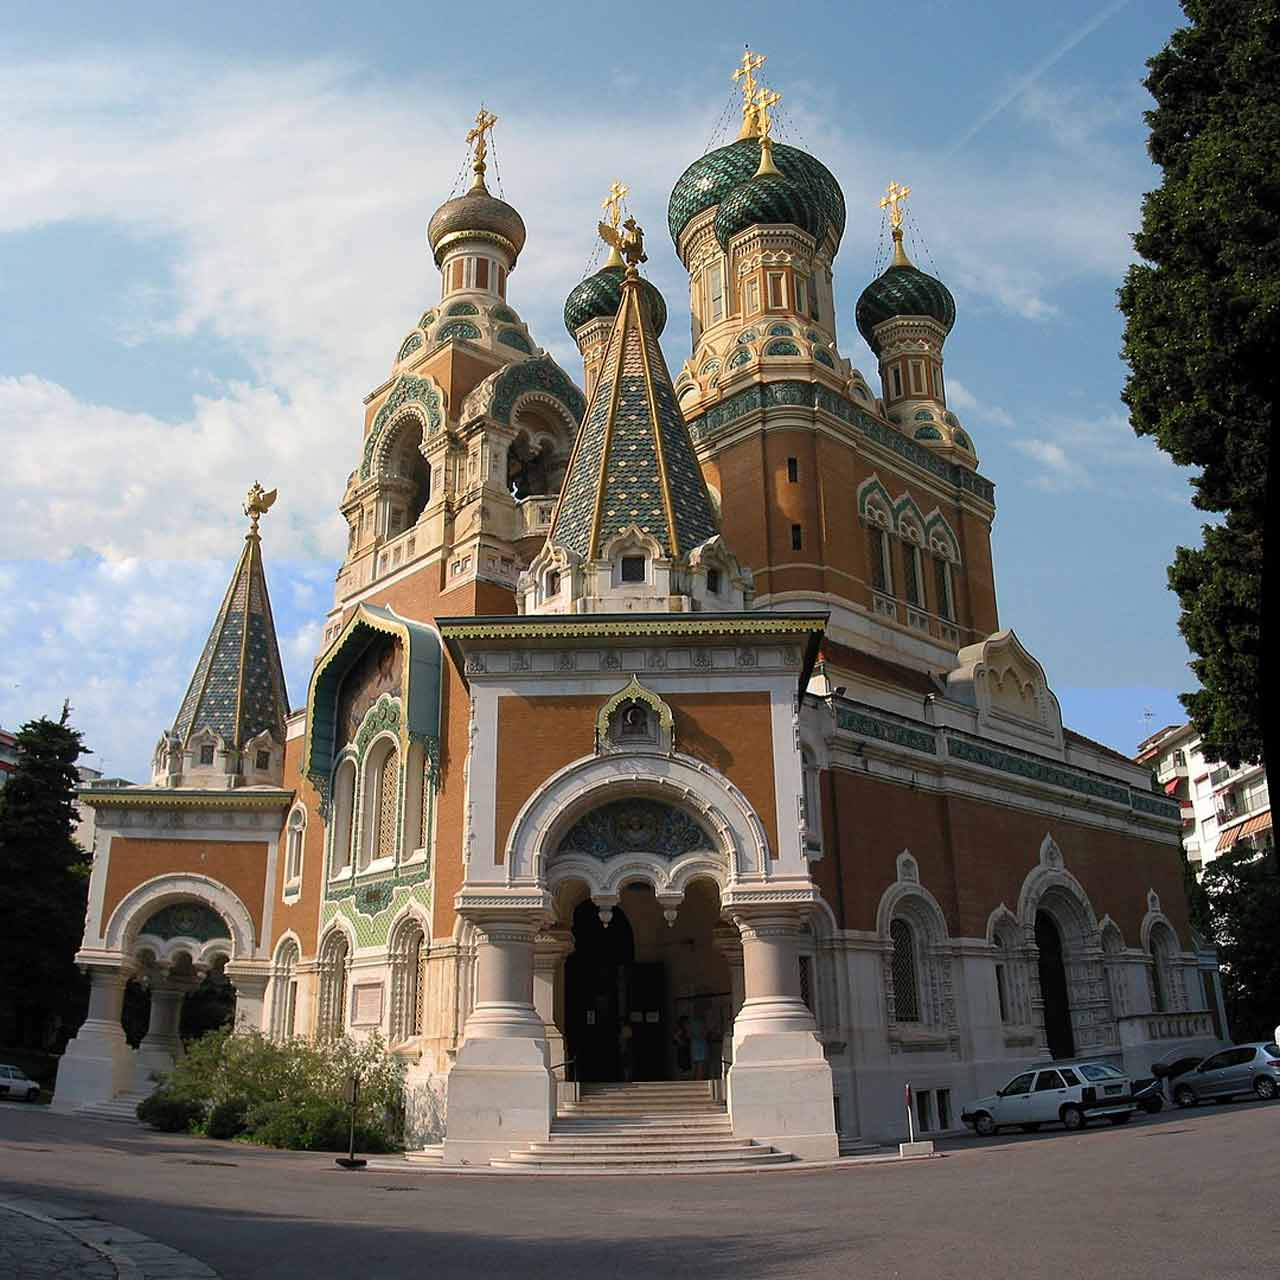 Cathédrale Saint-Nicolas, Nice